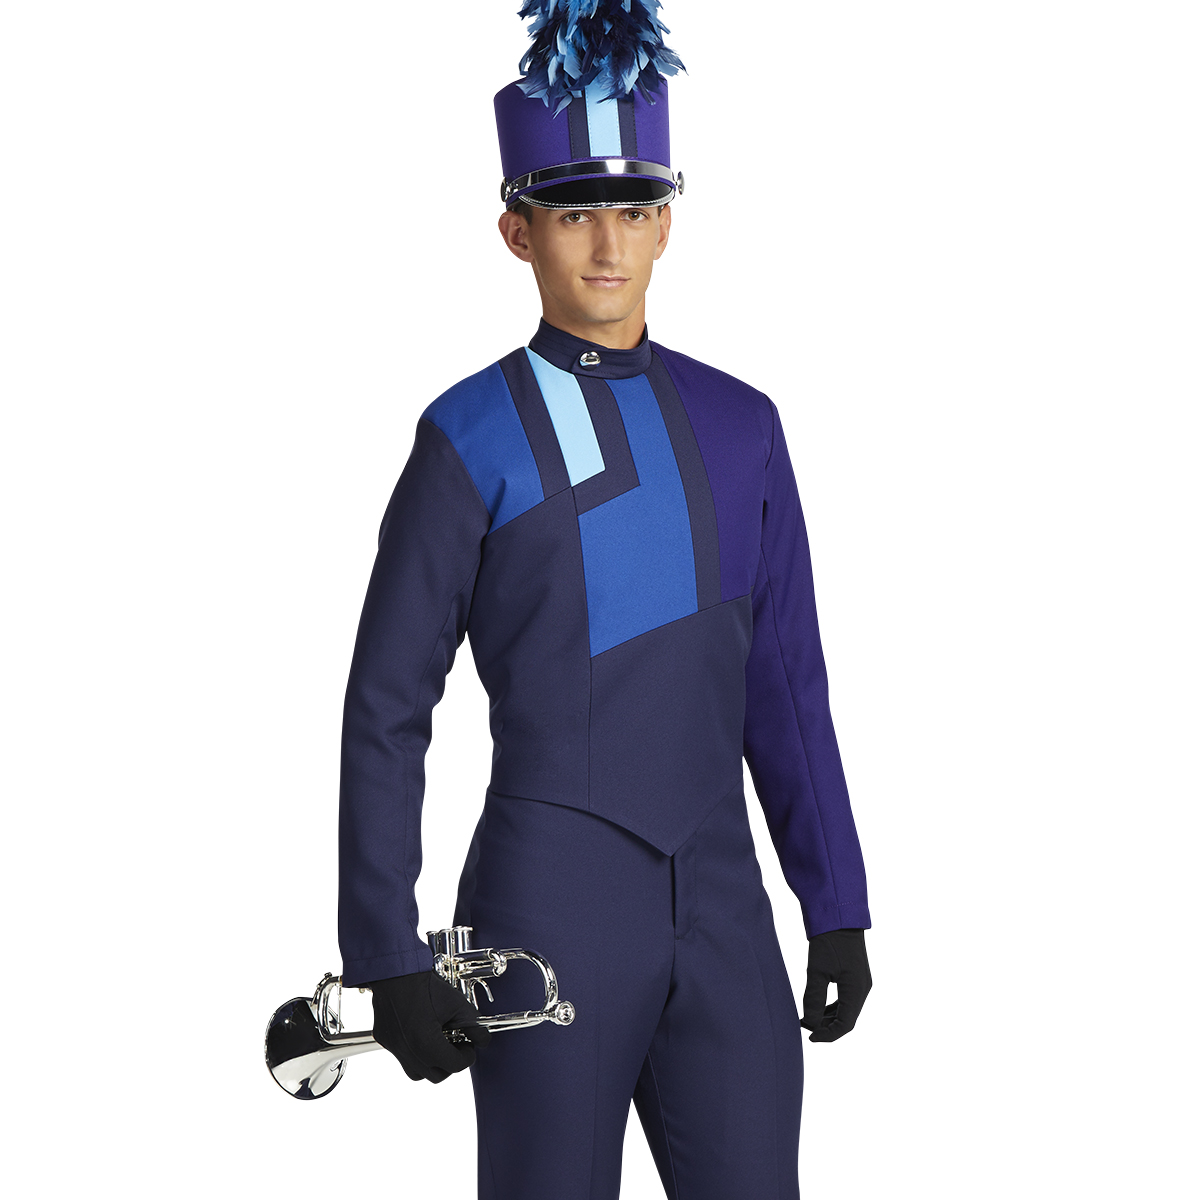 In Stock Asymmetrical Guard Tunic 442096 | Marching Band ...  |Band Shoppe Uniforms